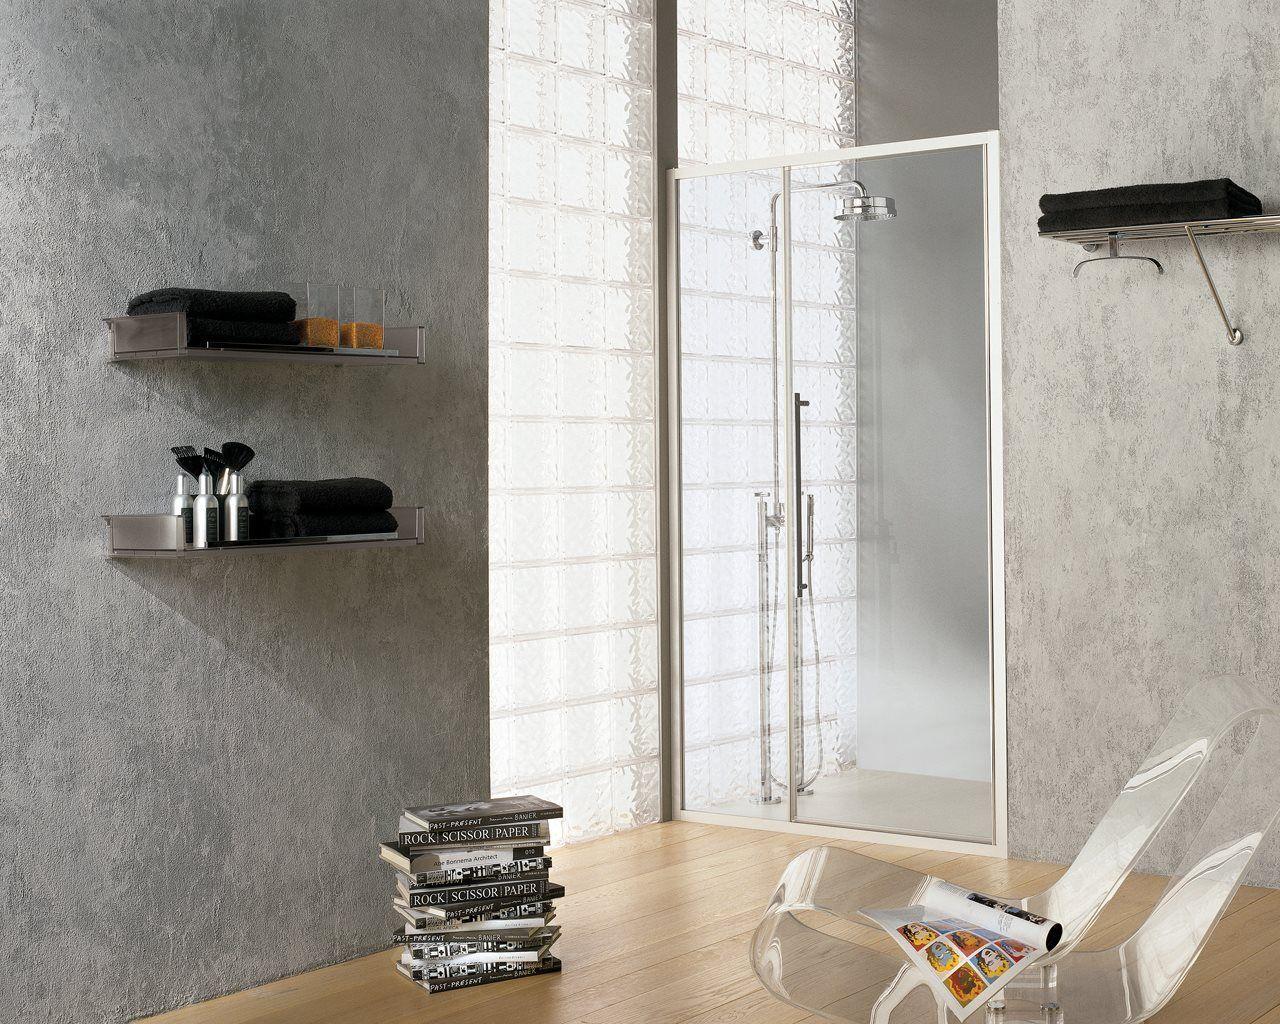 Parete doccia TRENDY DESIGN | Inda | Arredo bagno | Pinterest ...